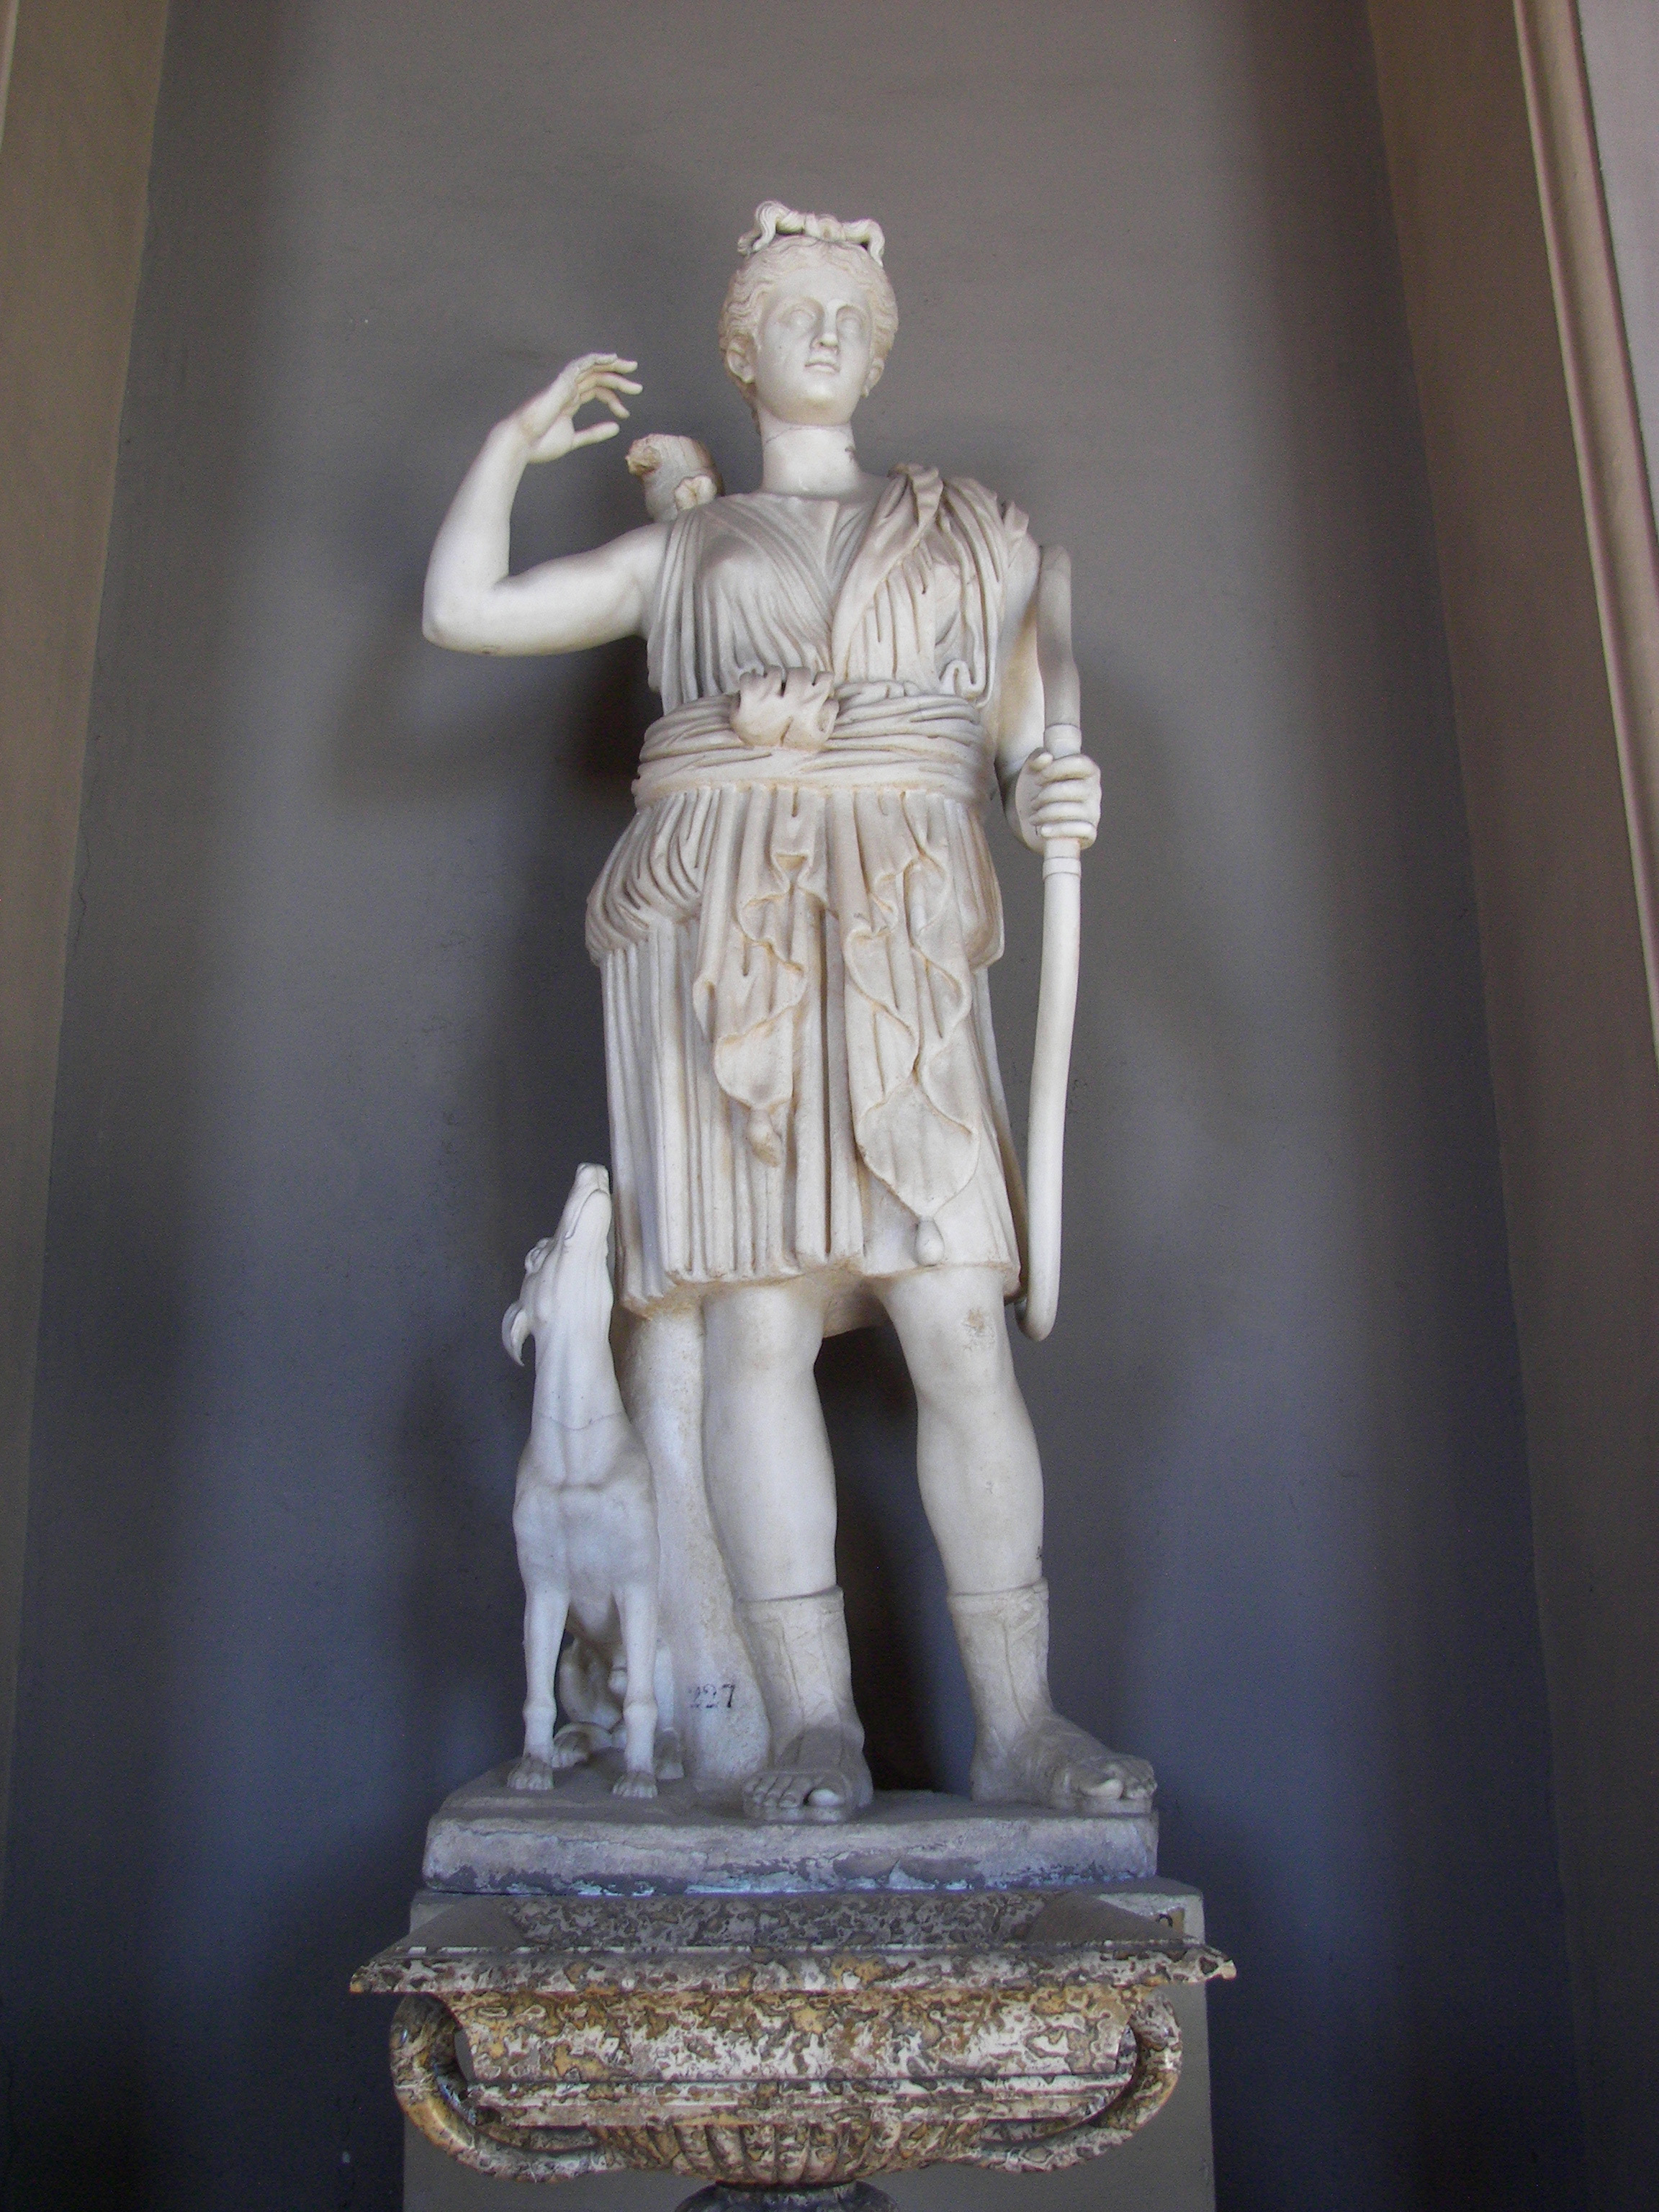 Library of 1985: Hesiod: The Birth of Greek Mythology